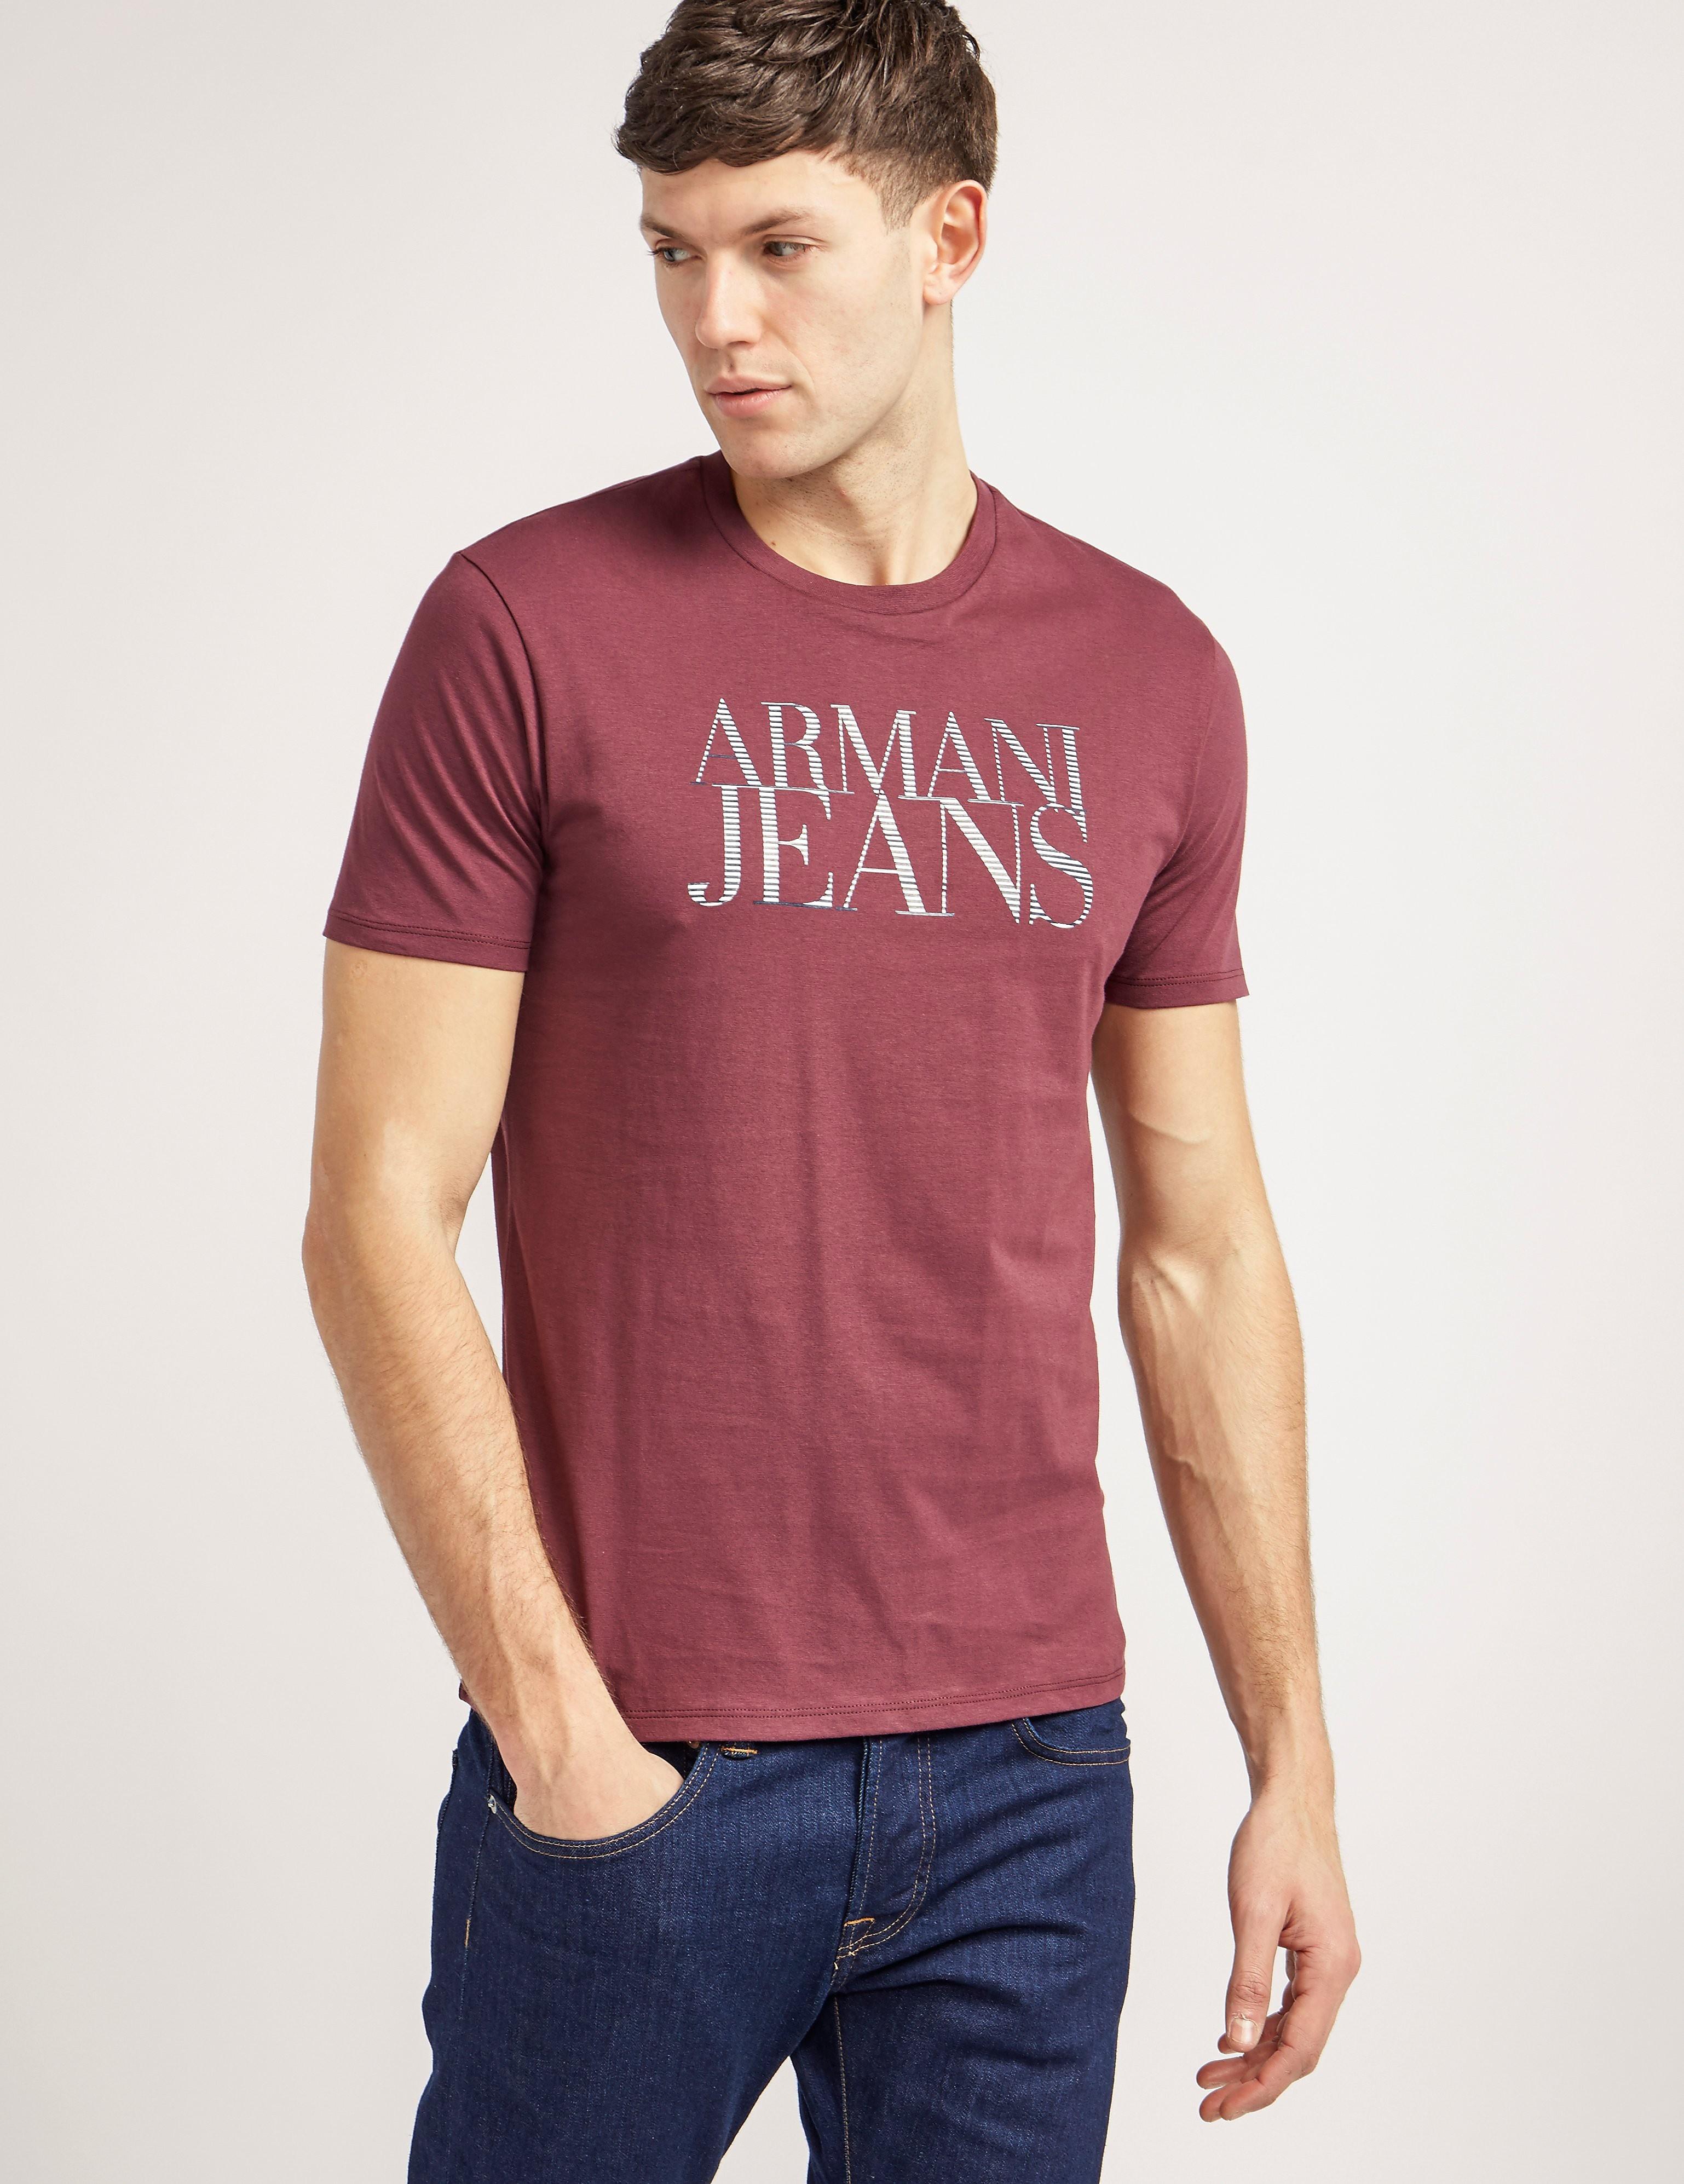 Armani Jeans Stripe Logo Crew Short Sleeve T-Shirt